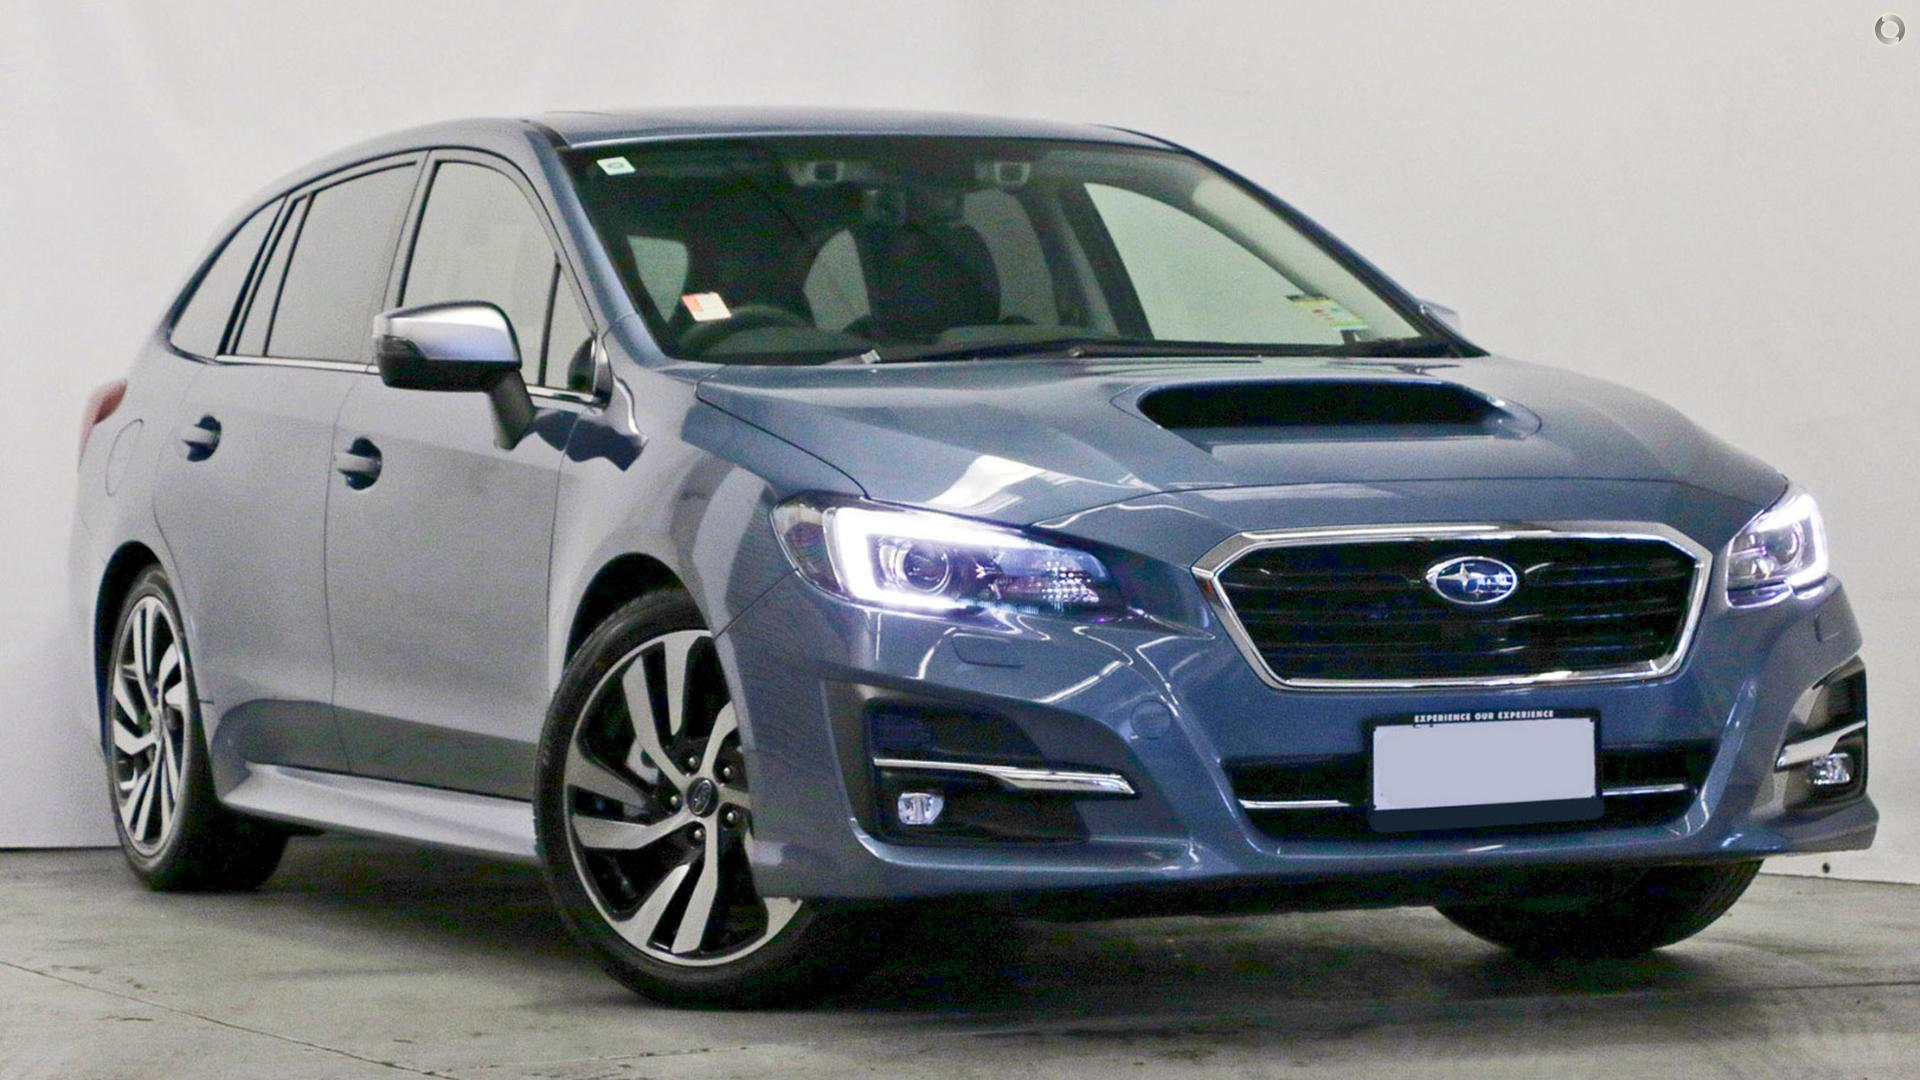 2018 Subaru Levorg 2.0 Gt-s